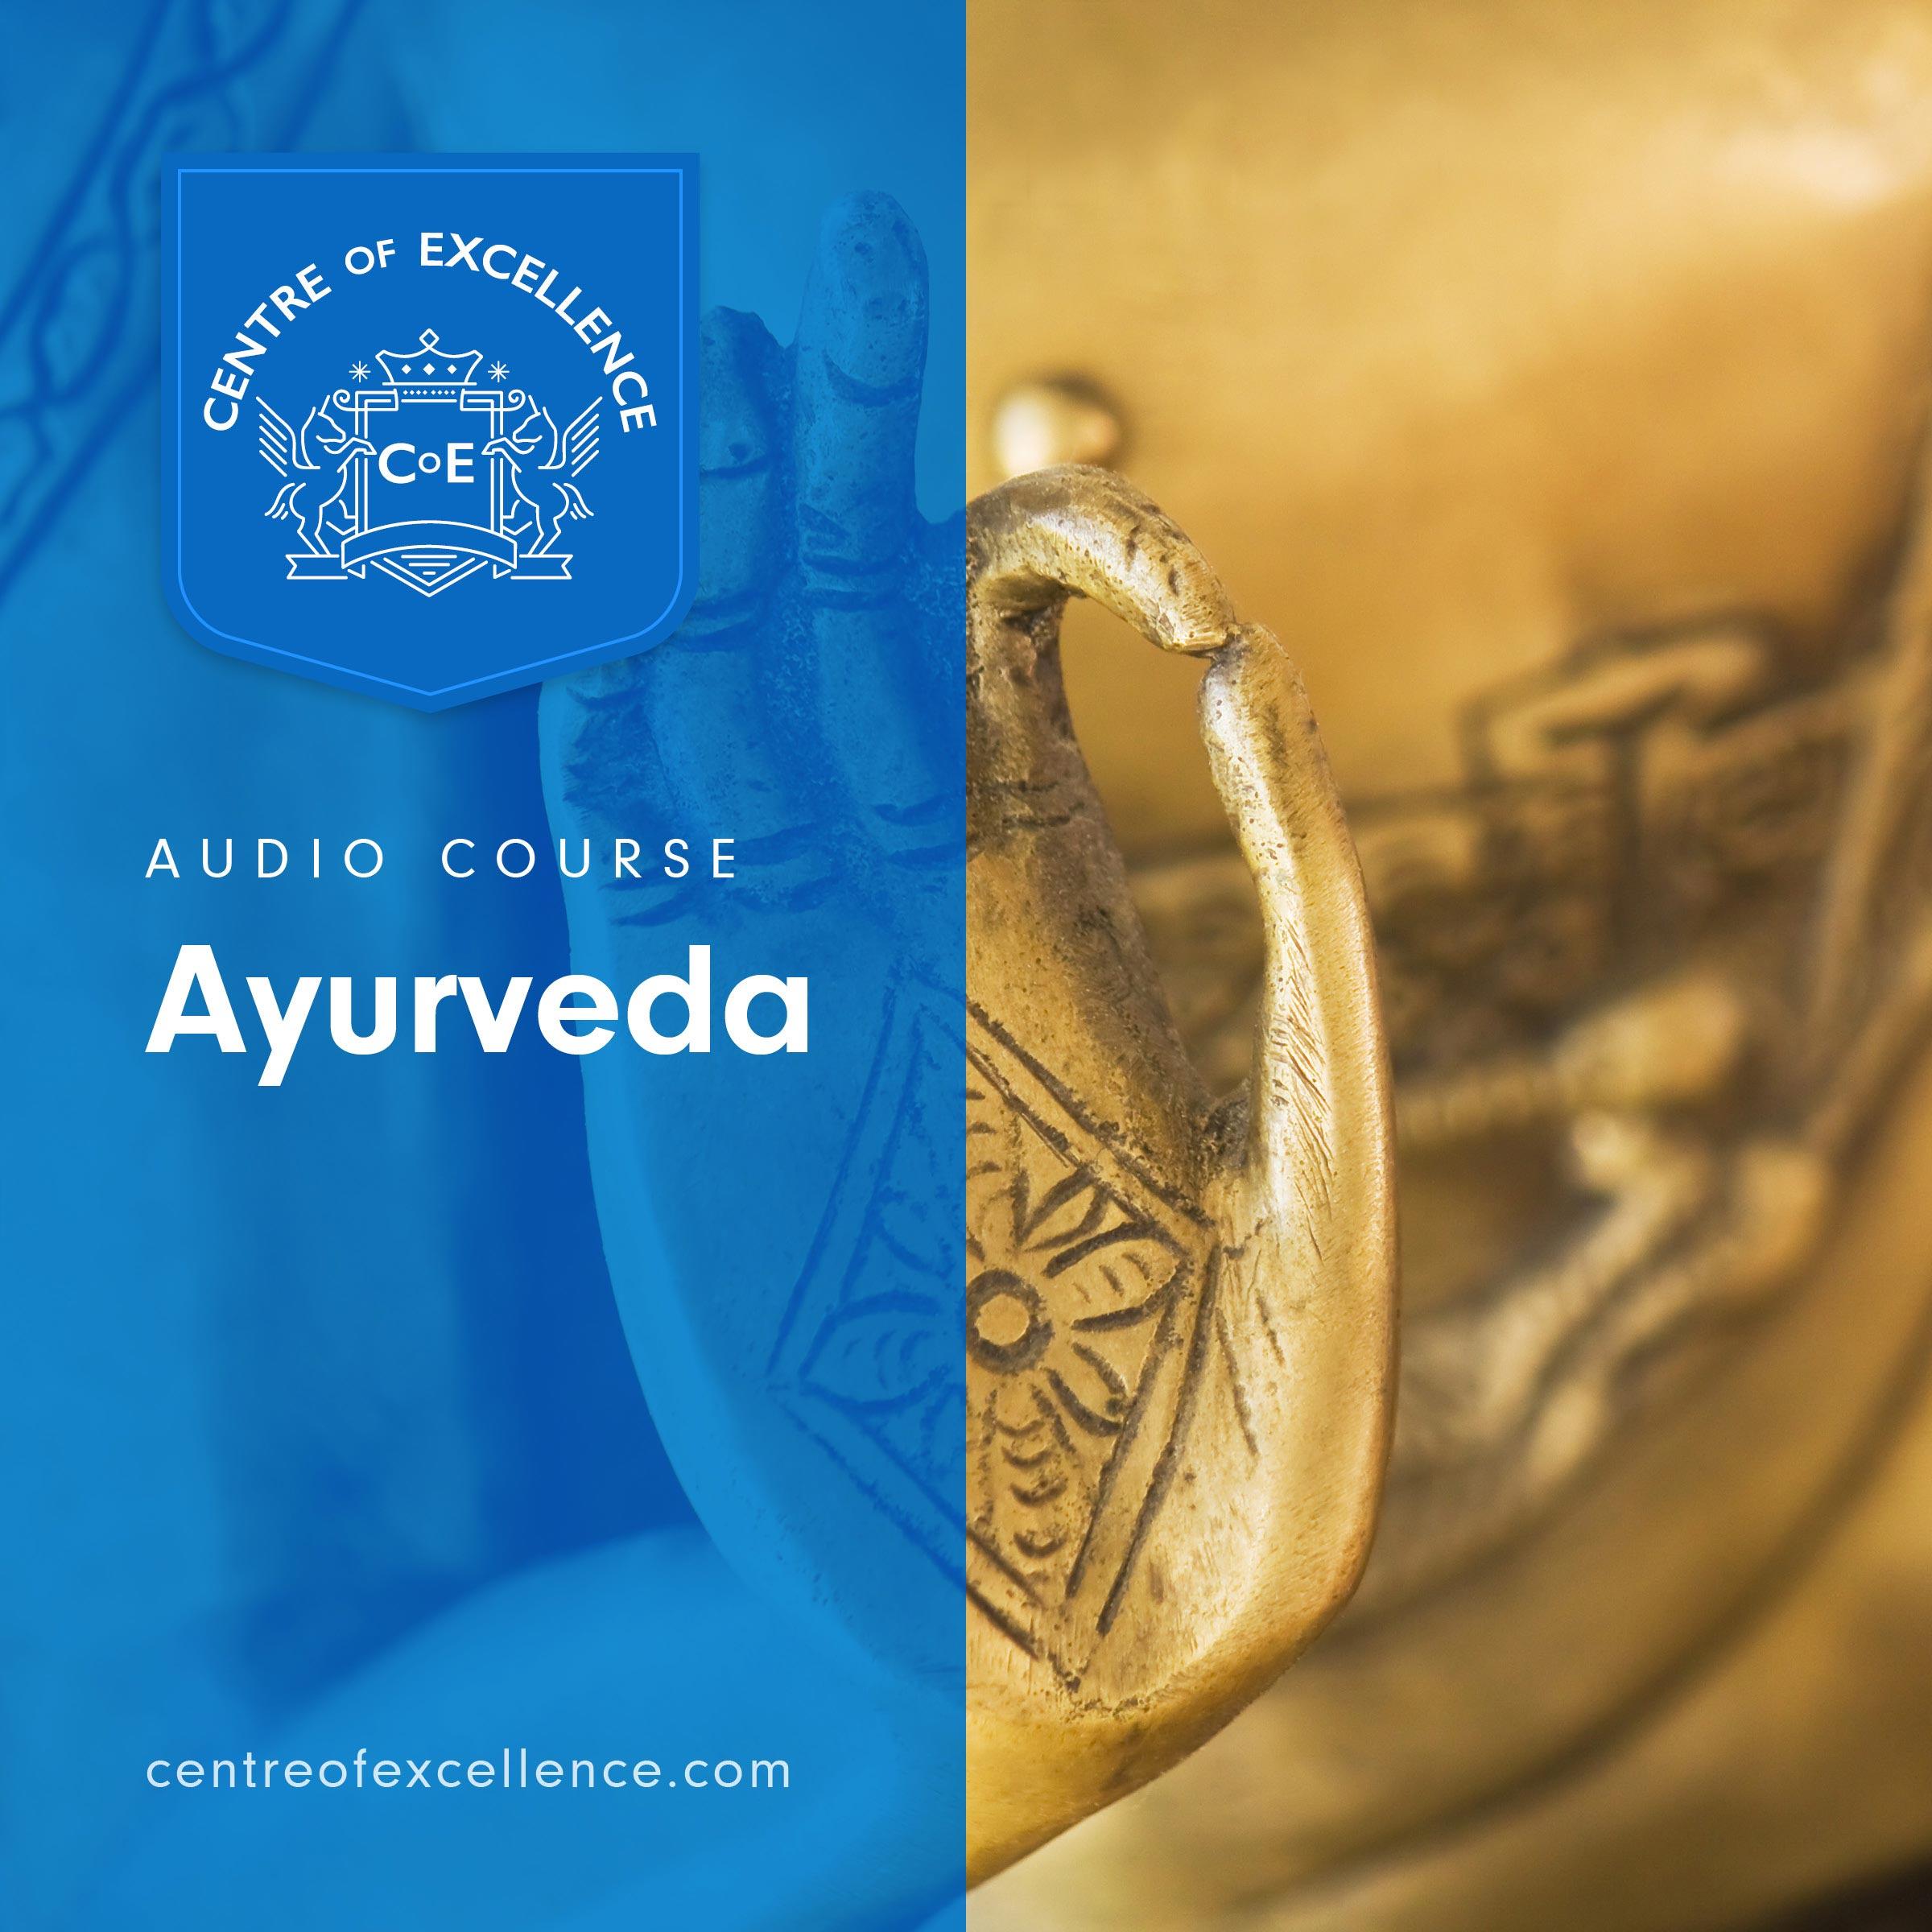 Ayurveda Audio Course Cover Image